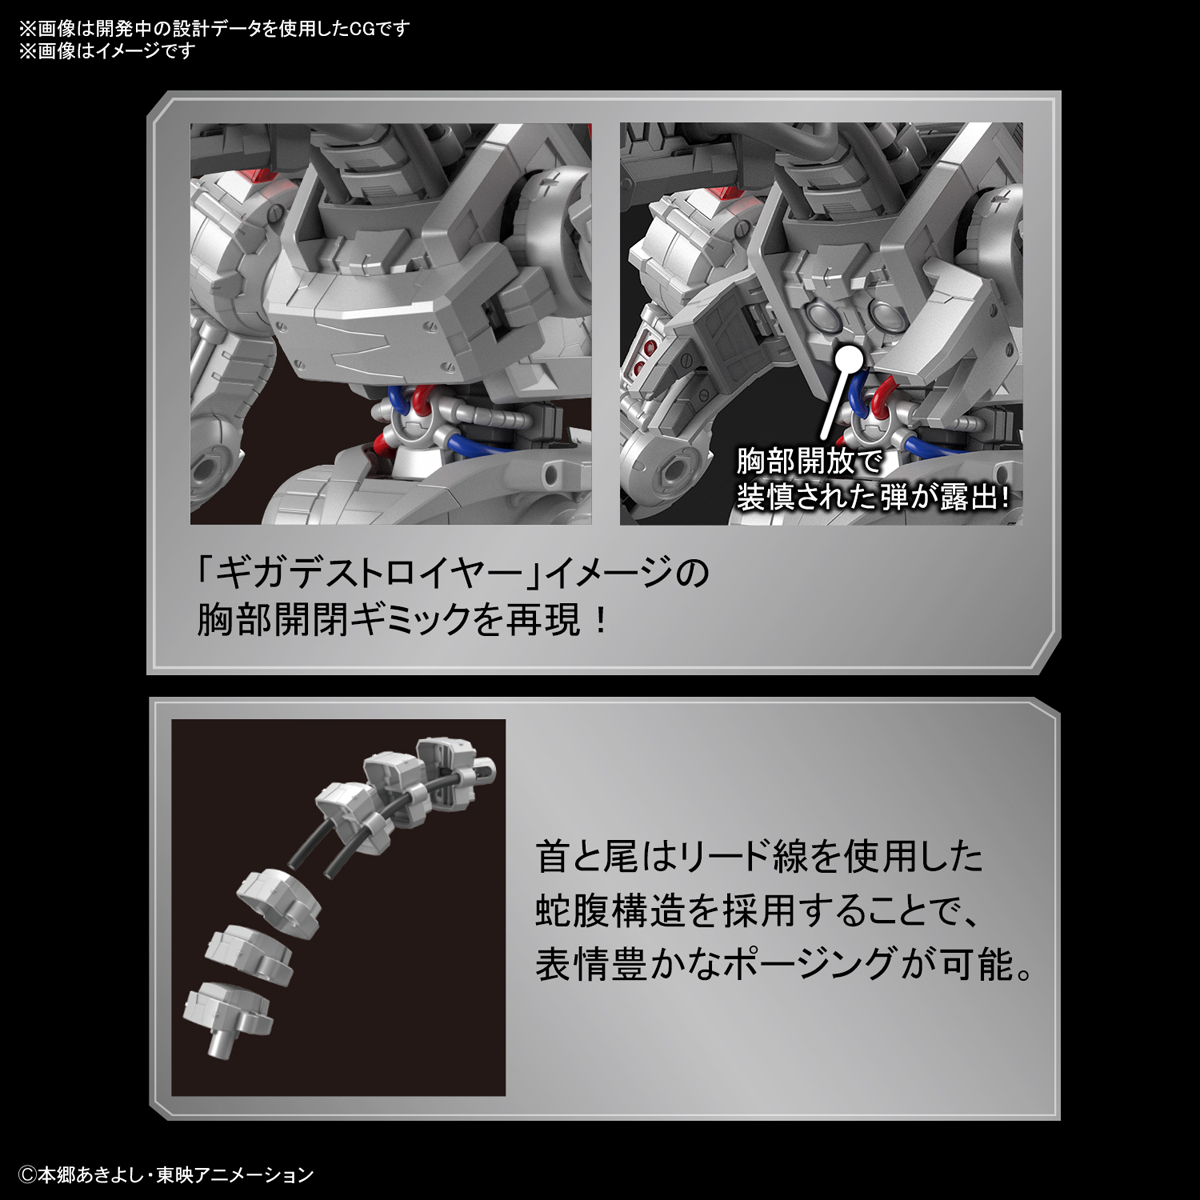 Figure-rise Standard Amplifie『ムゲンドラモン』デジモンアドベンチャー プラモデル-005